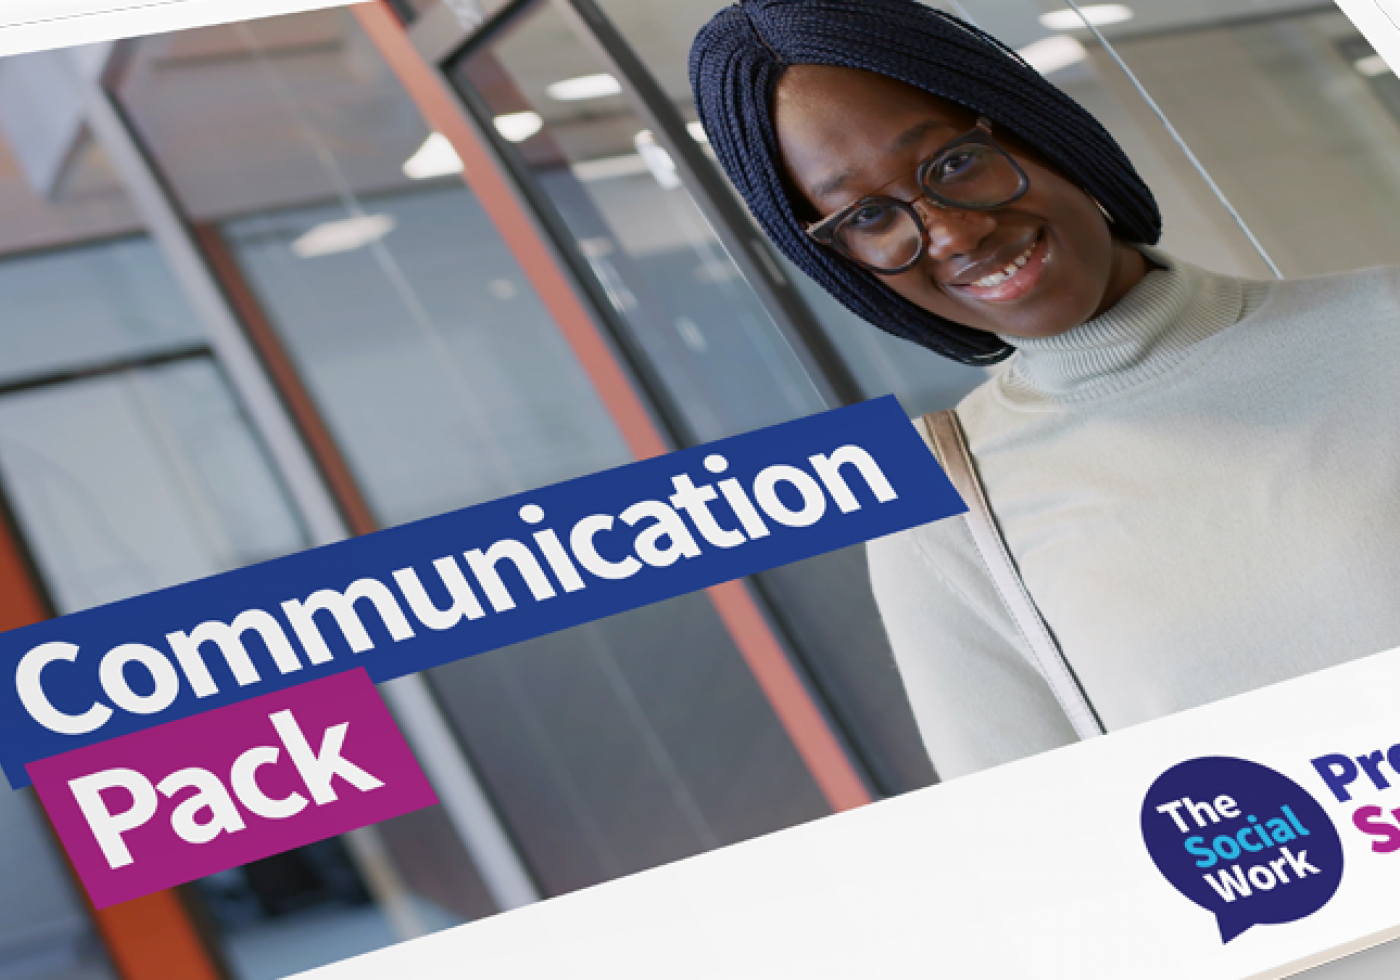 PSS communication pack